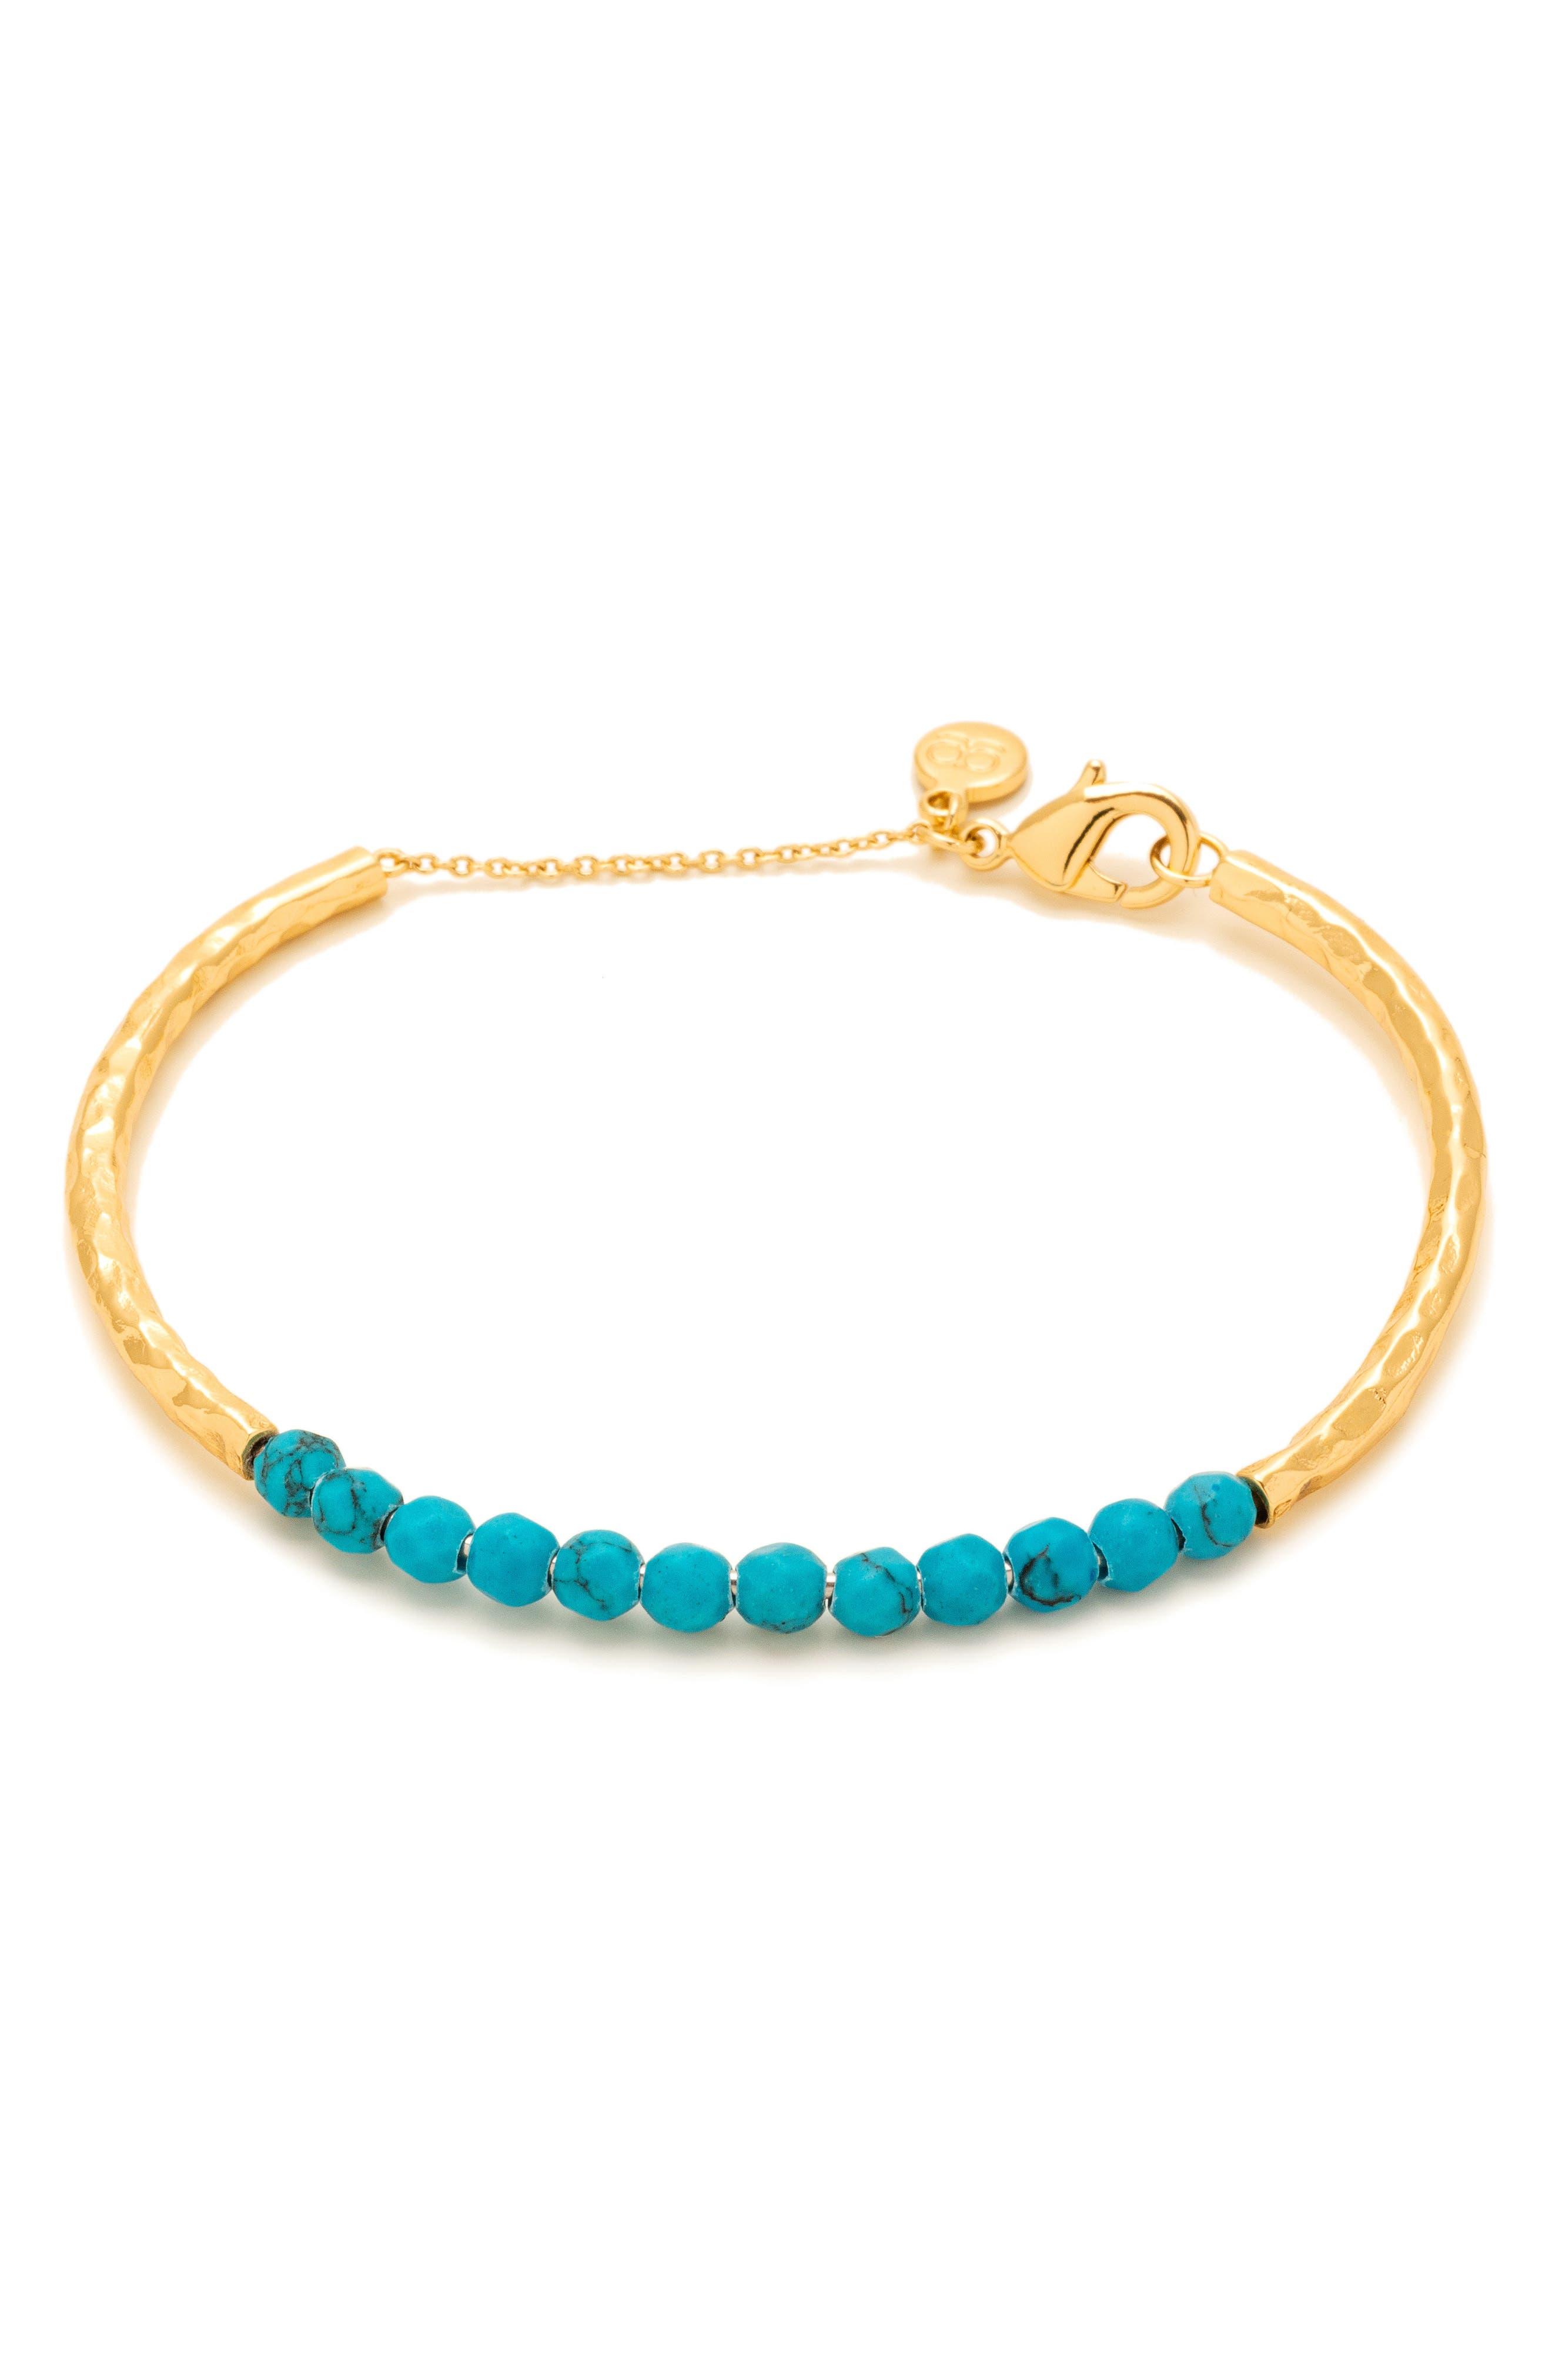 Power Stone Semiprecious Beaded Bracelet,                         Main,                         color, Turquoise / Gold